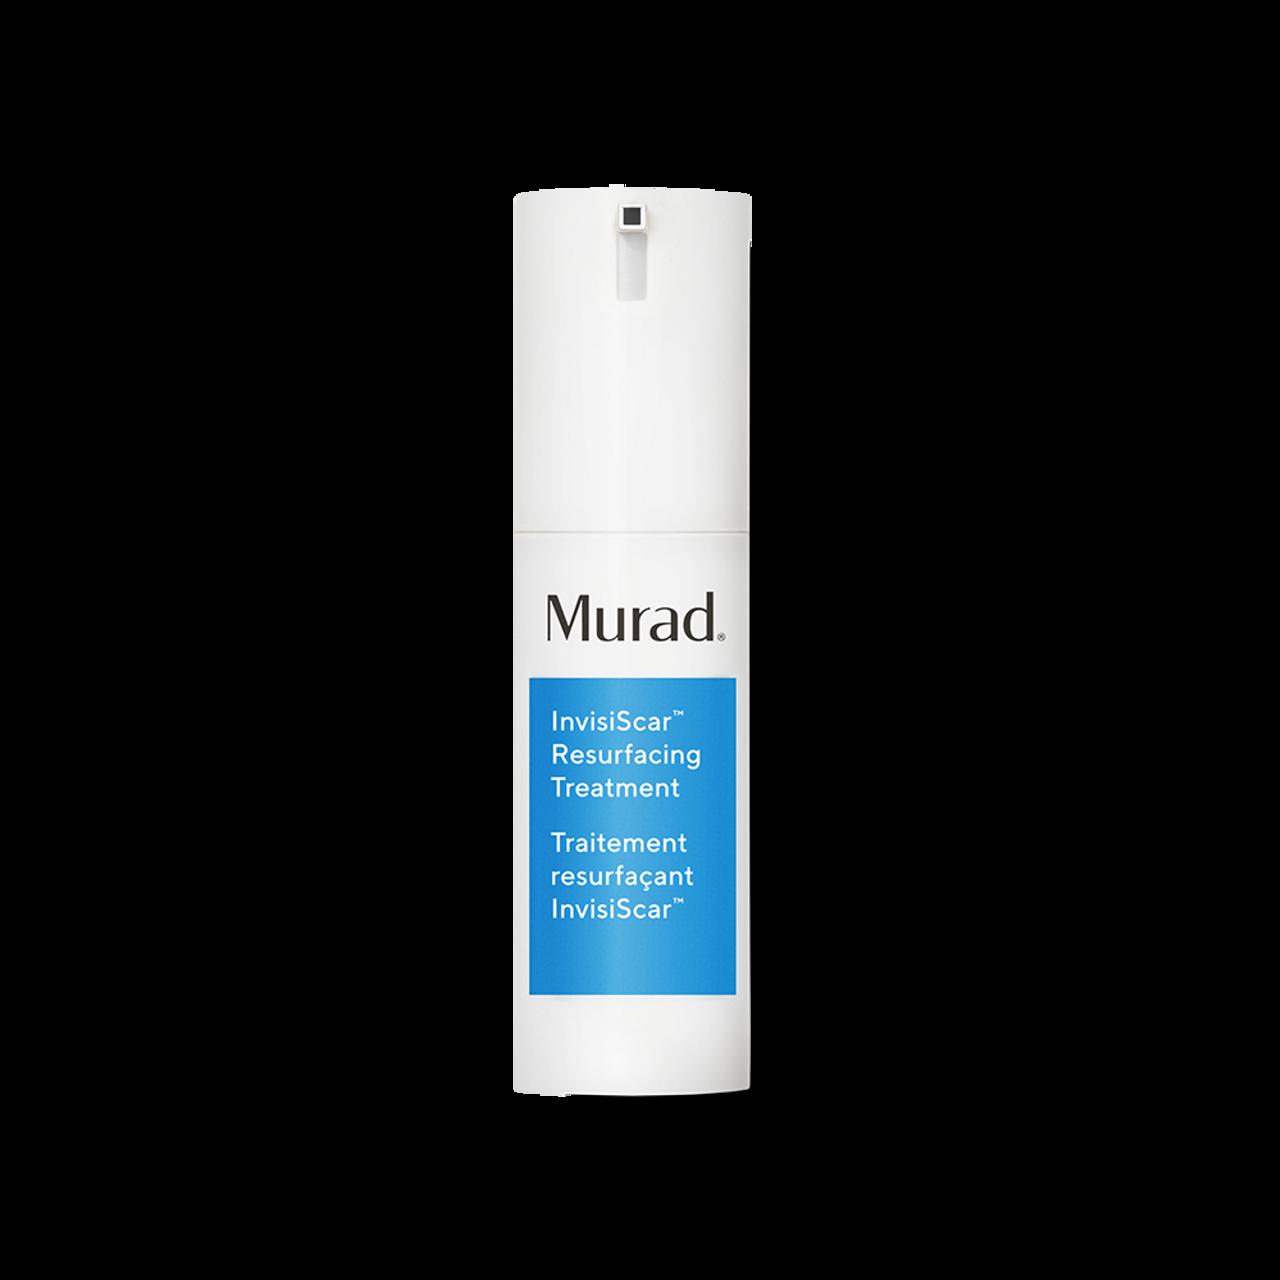 Murad InvisiScar Resurfacing Treatment Larger Size - 1.0 Fl. Oz